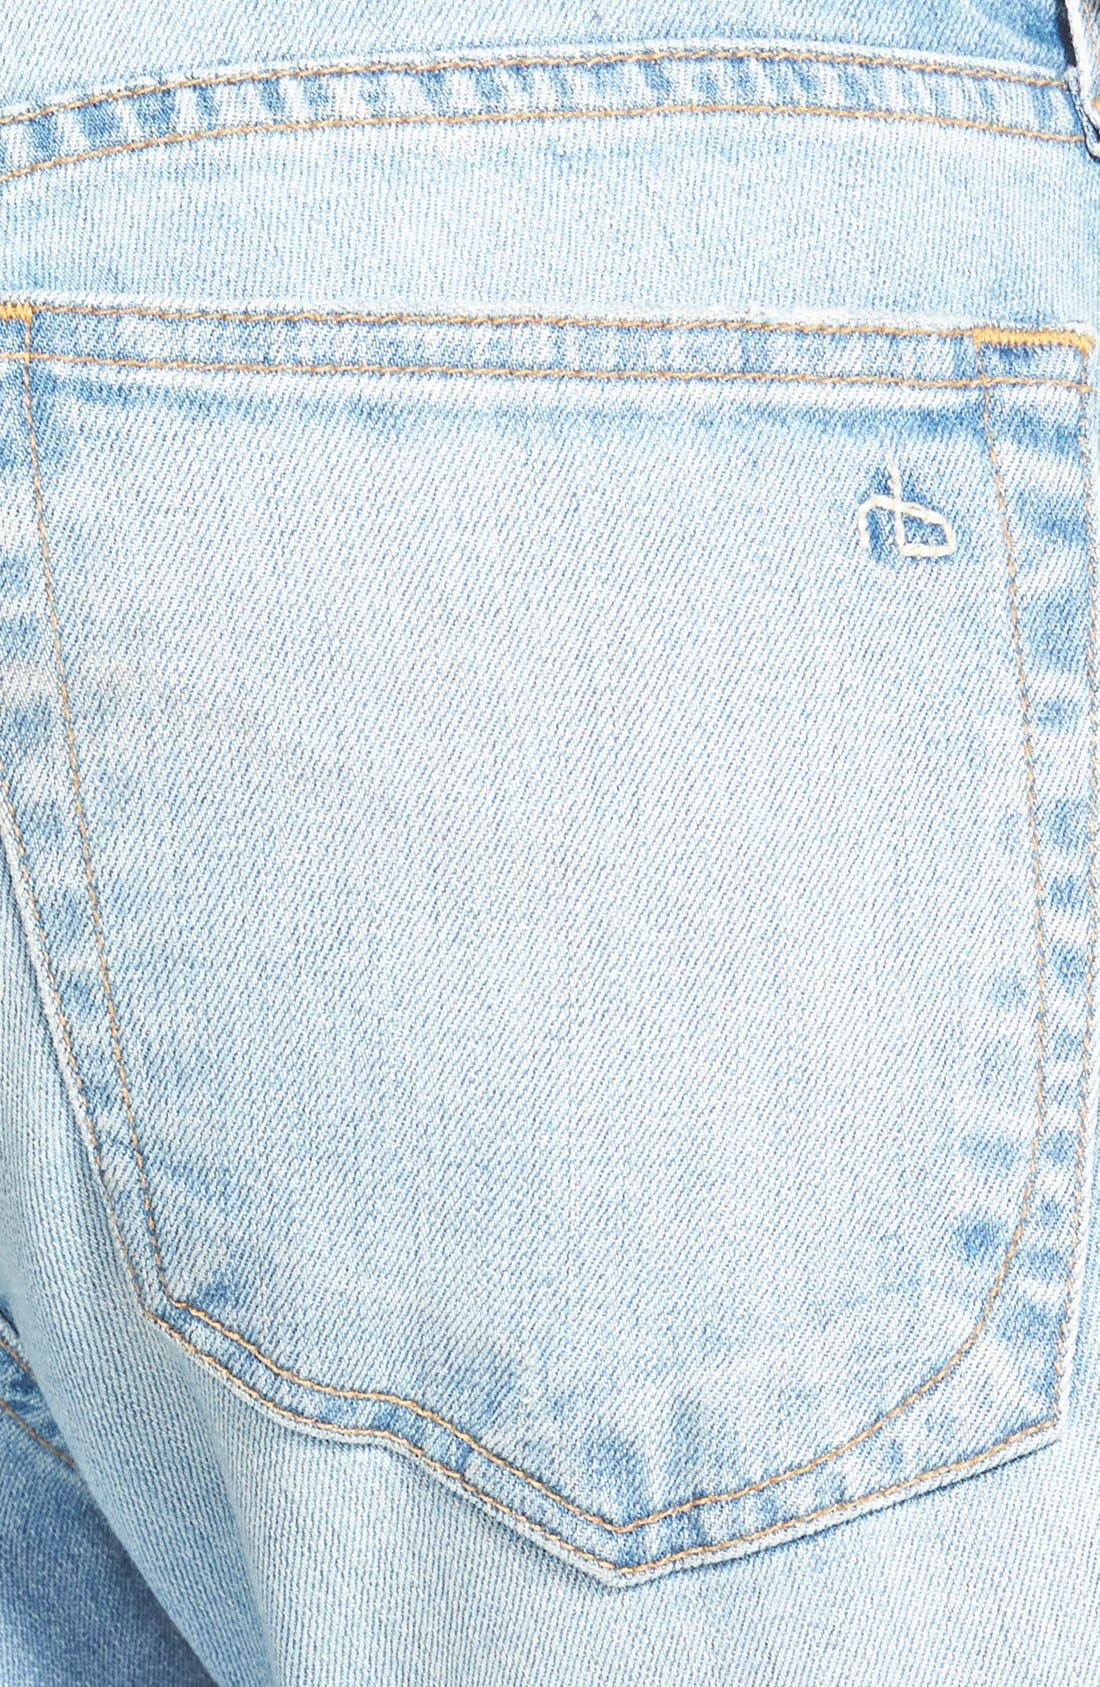 Alternate Image 3  - rag & bone/JEAN 'Dre' Distressed Ankle Jeans (Abingdon)